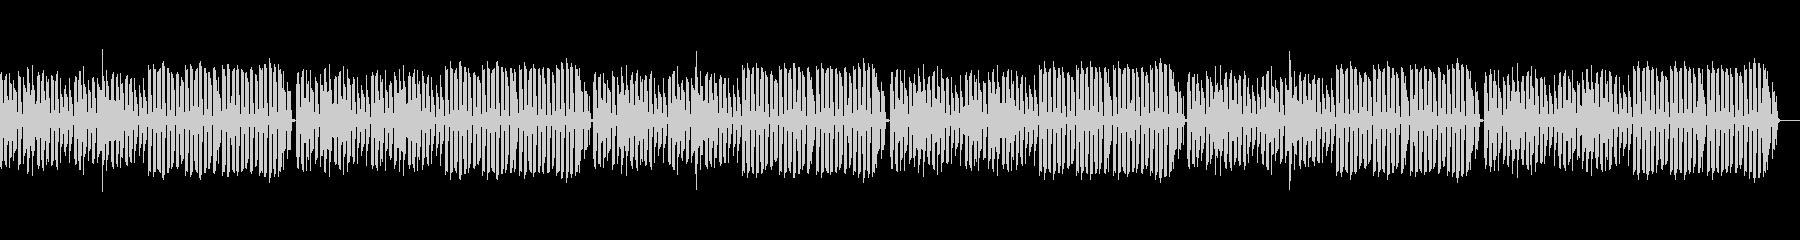 YouTube ほのぼの ピアノ のどかの未再生の波形